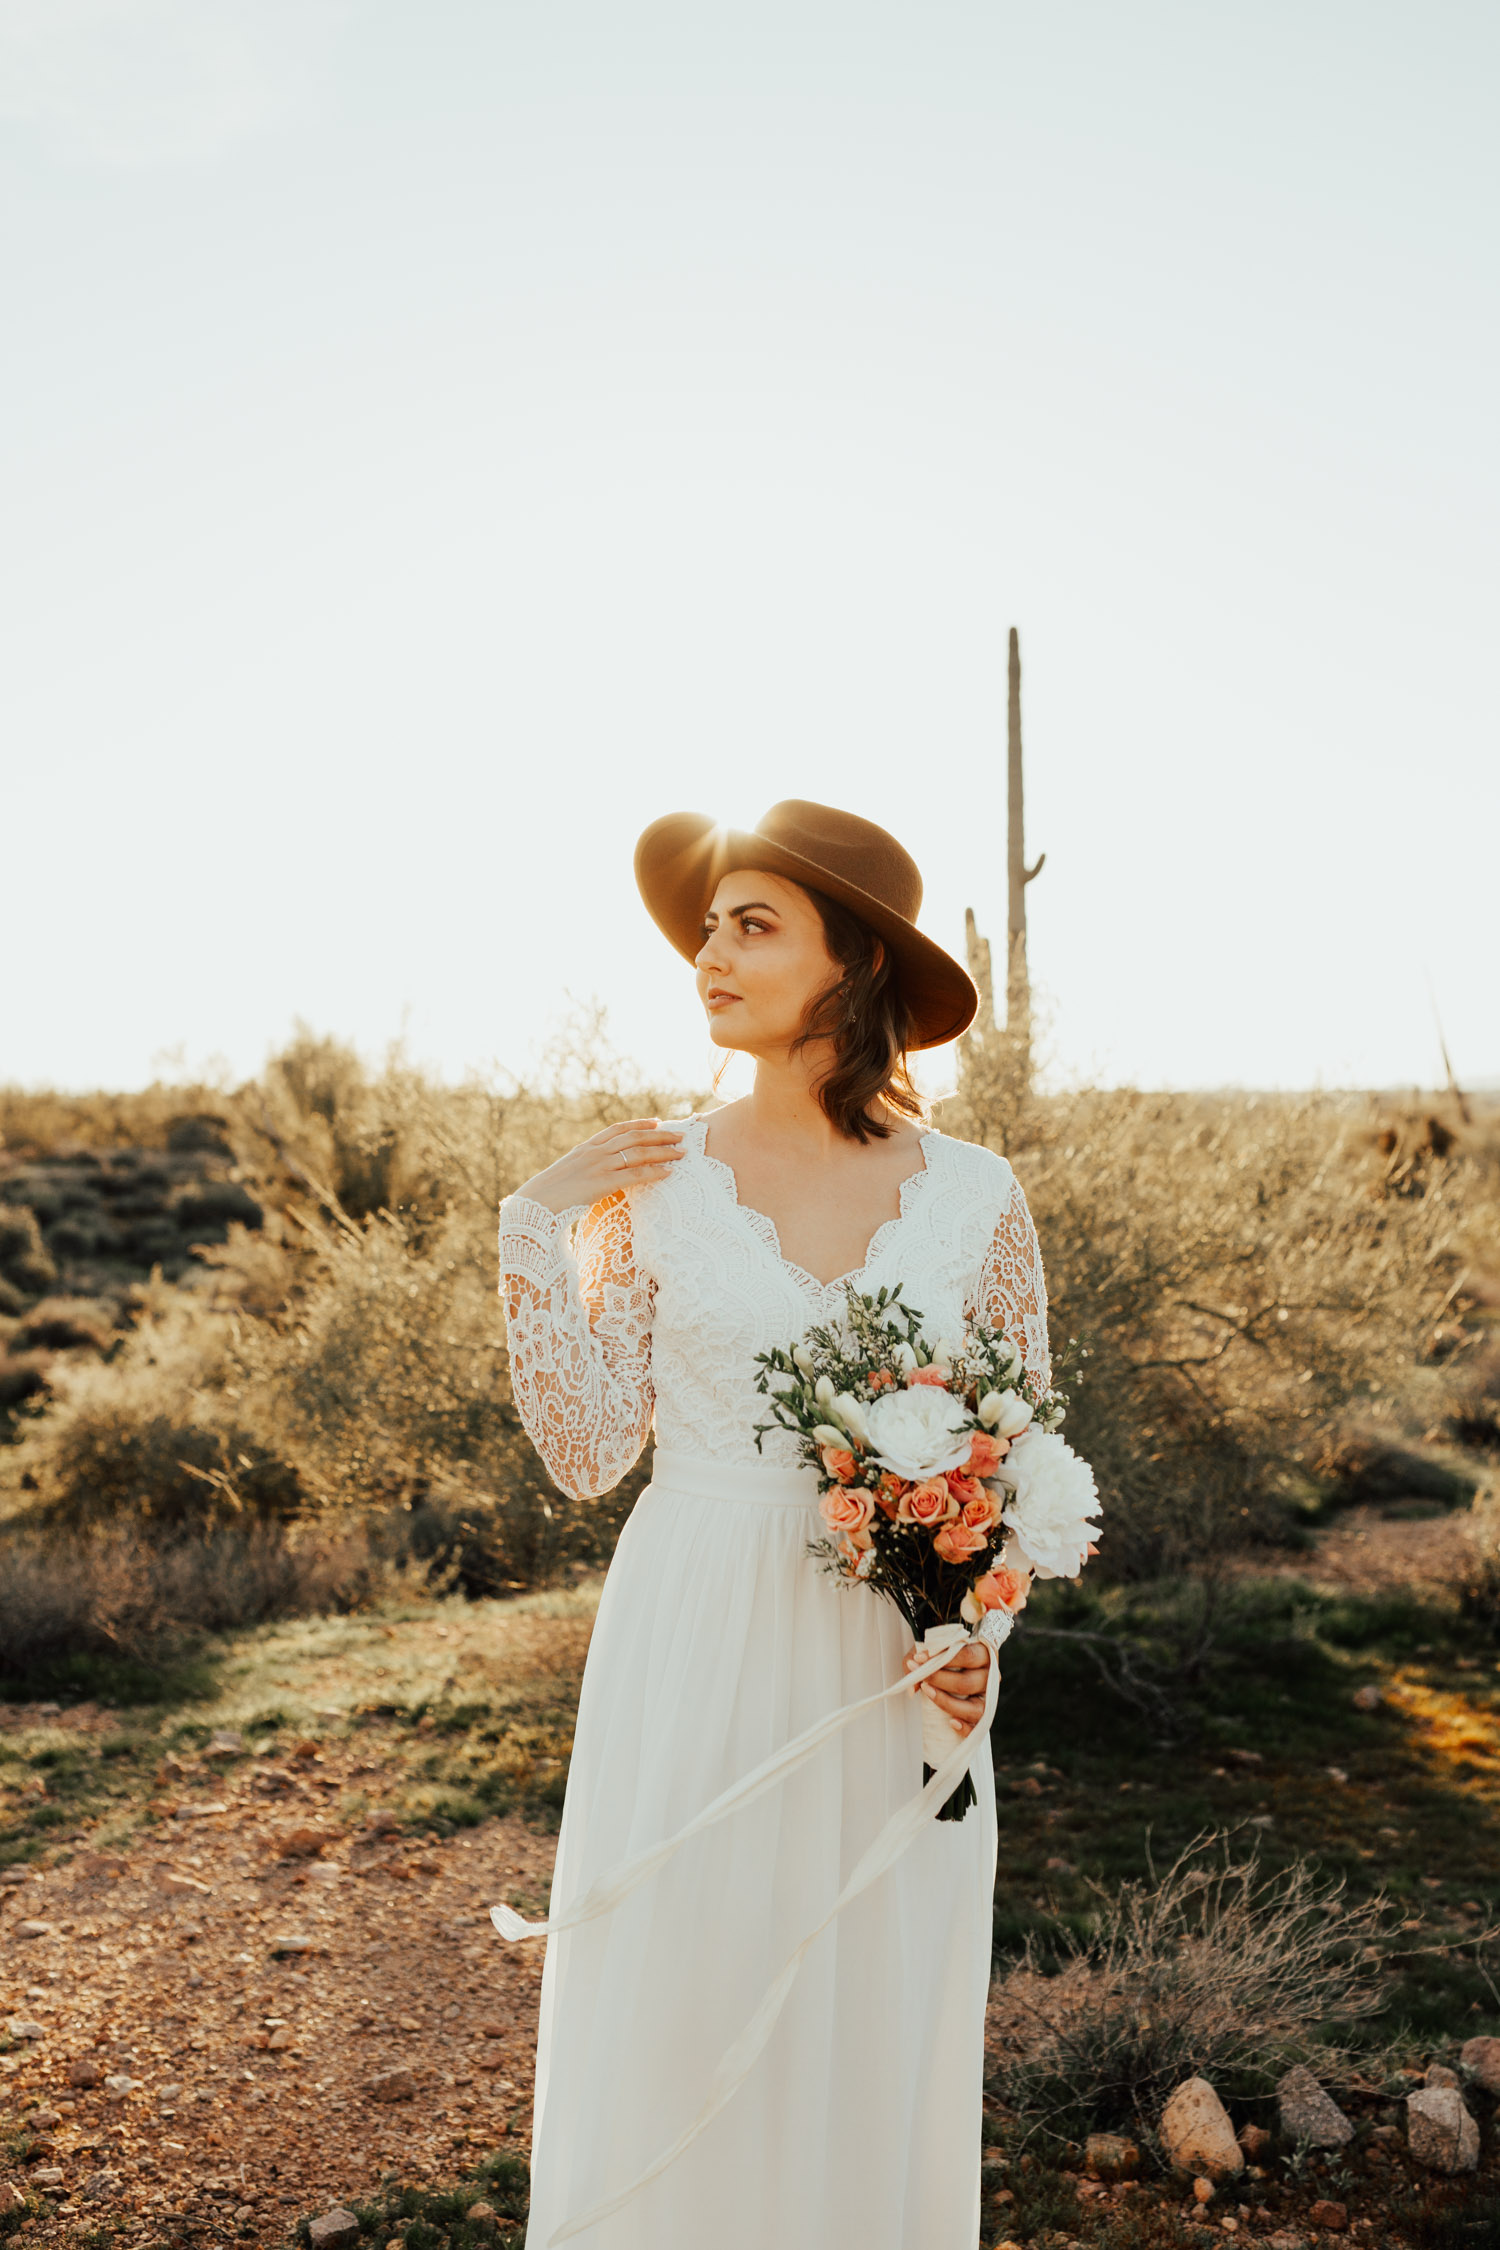 boho-desert-wedding-elopement-arizona-photographer-phoenix-bridals-enagement-bride